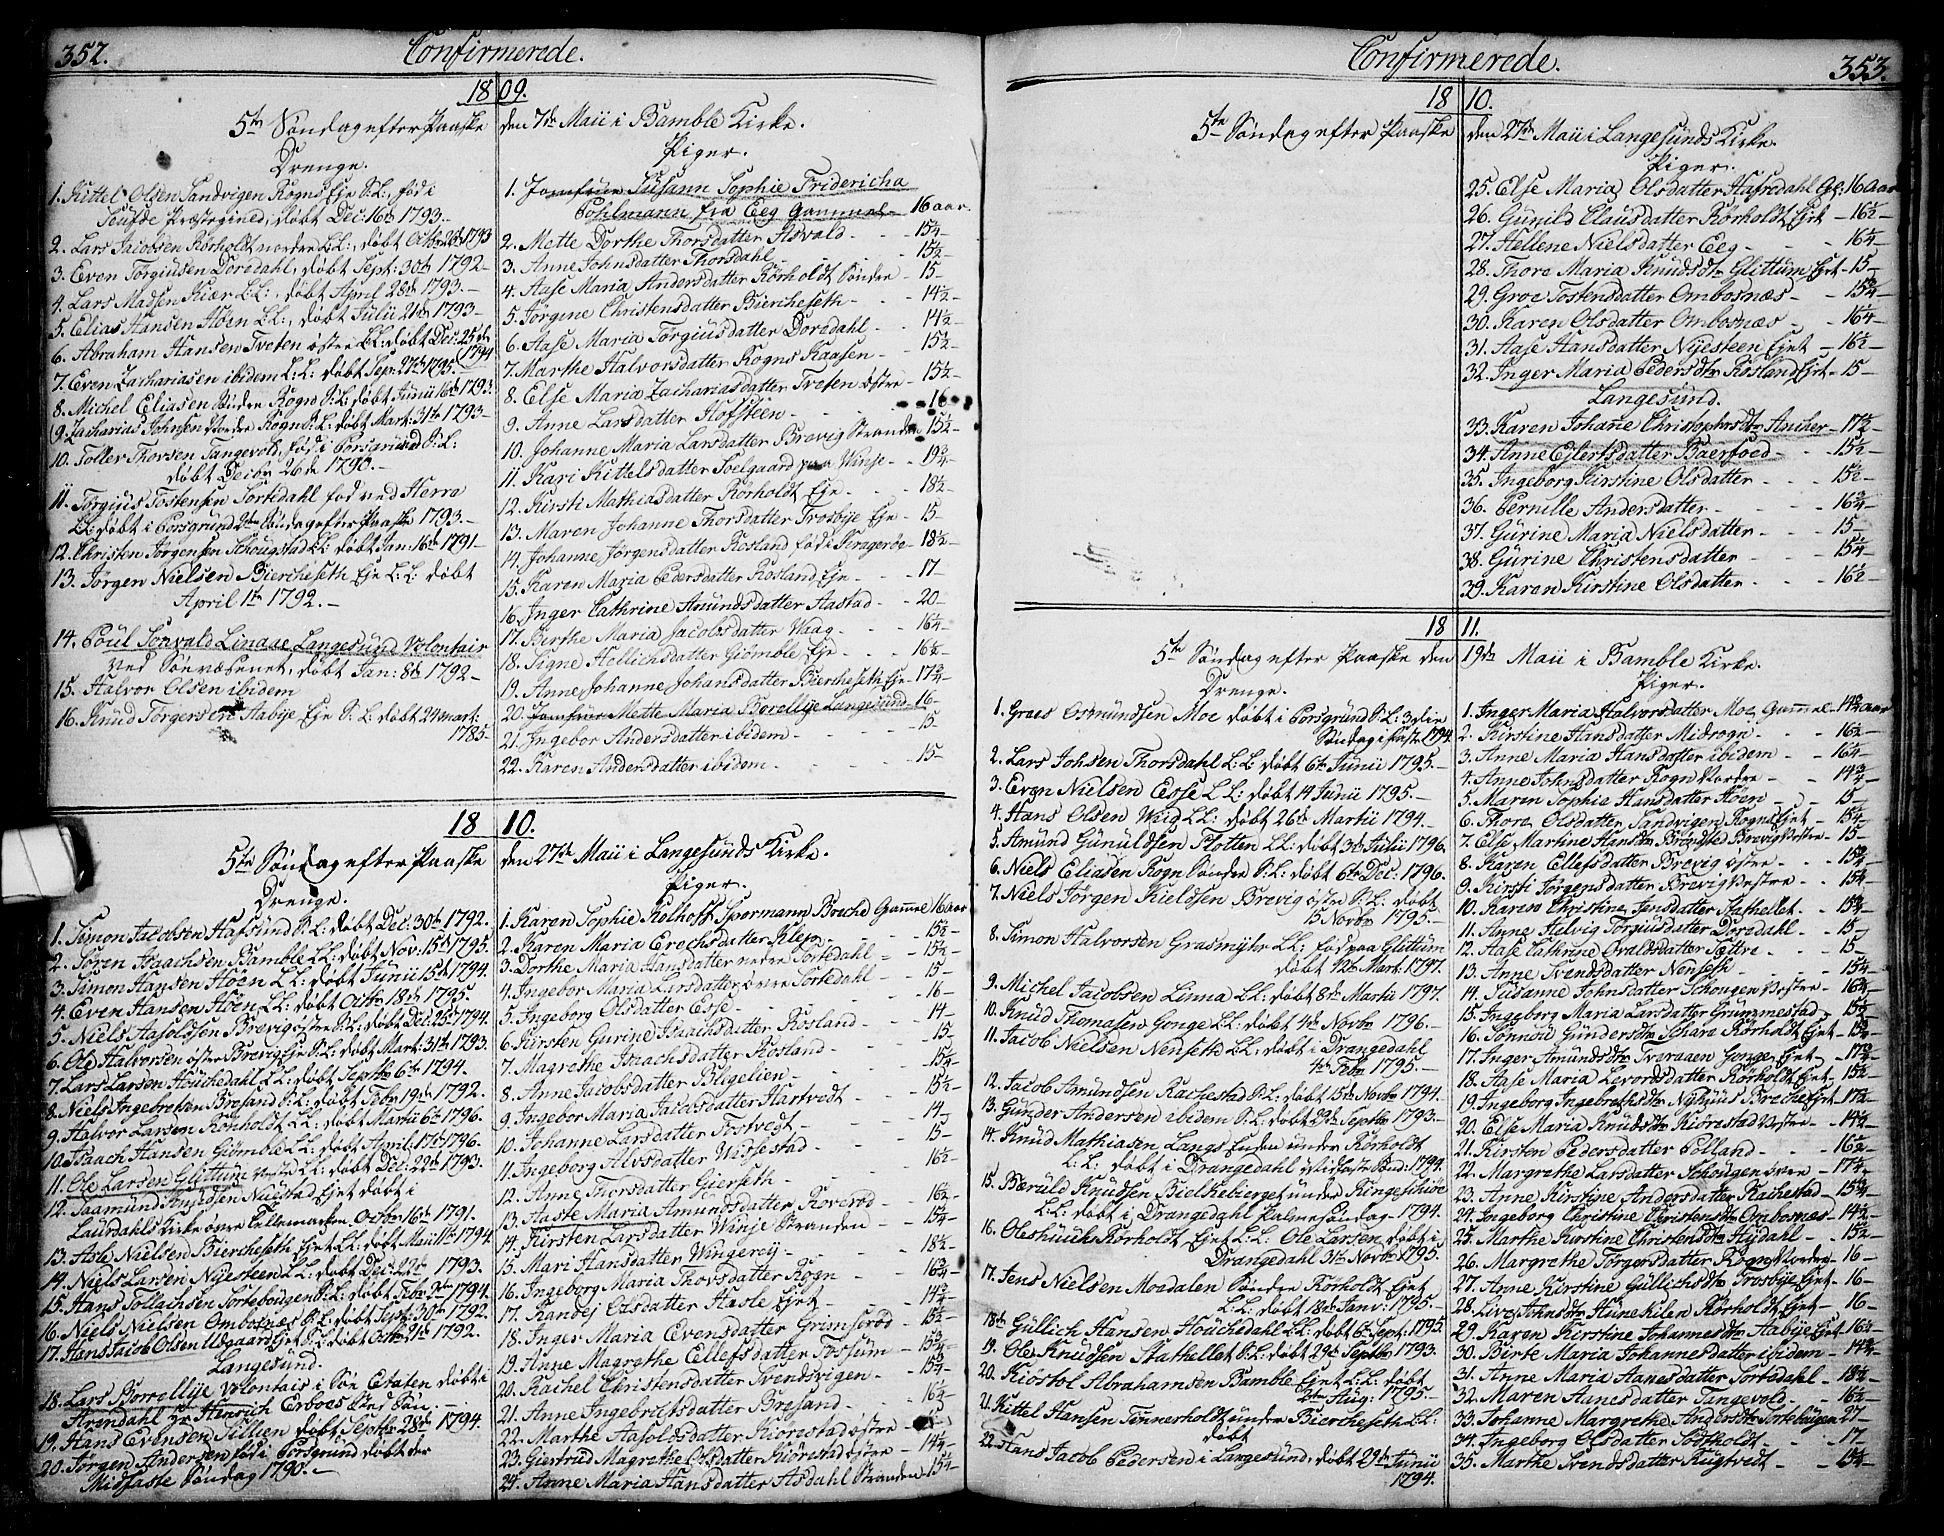 SAKO, Bamble kirkebøker, F/Fa/L0002: Ministerialbok nr. I 2, 1775-1814, s. 352-353